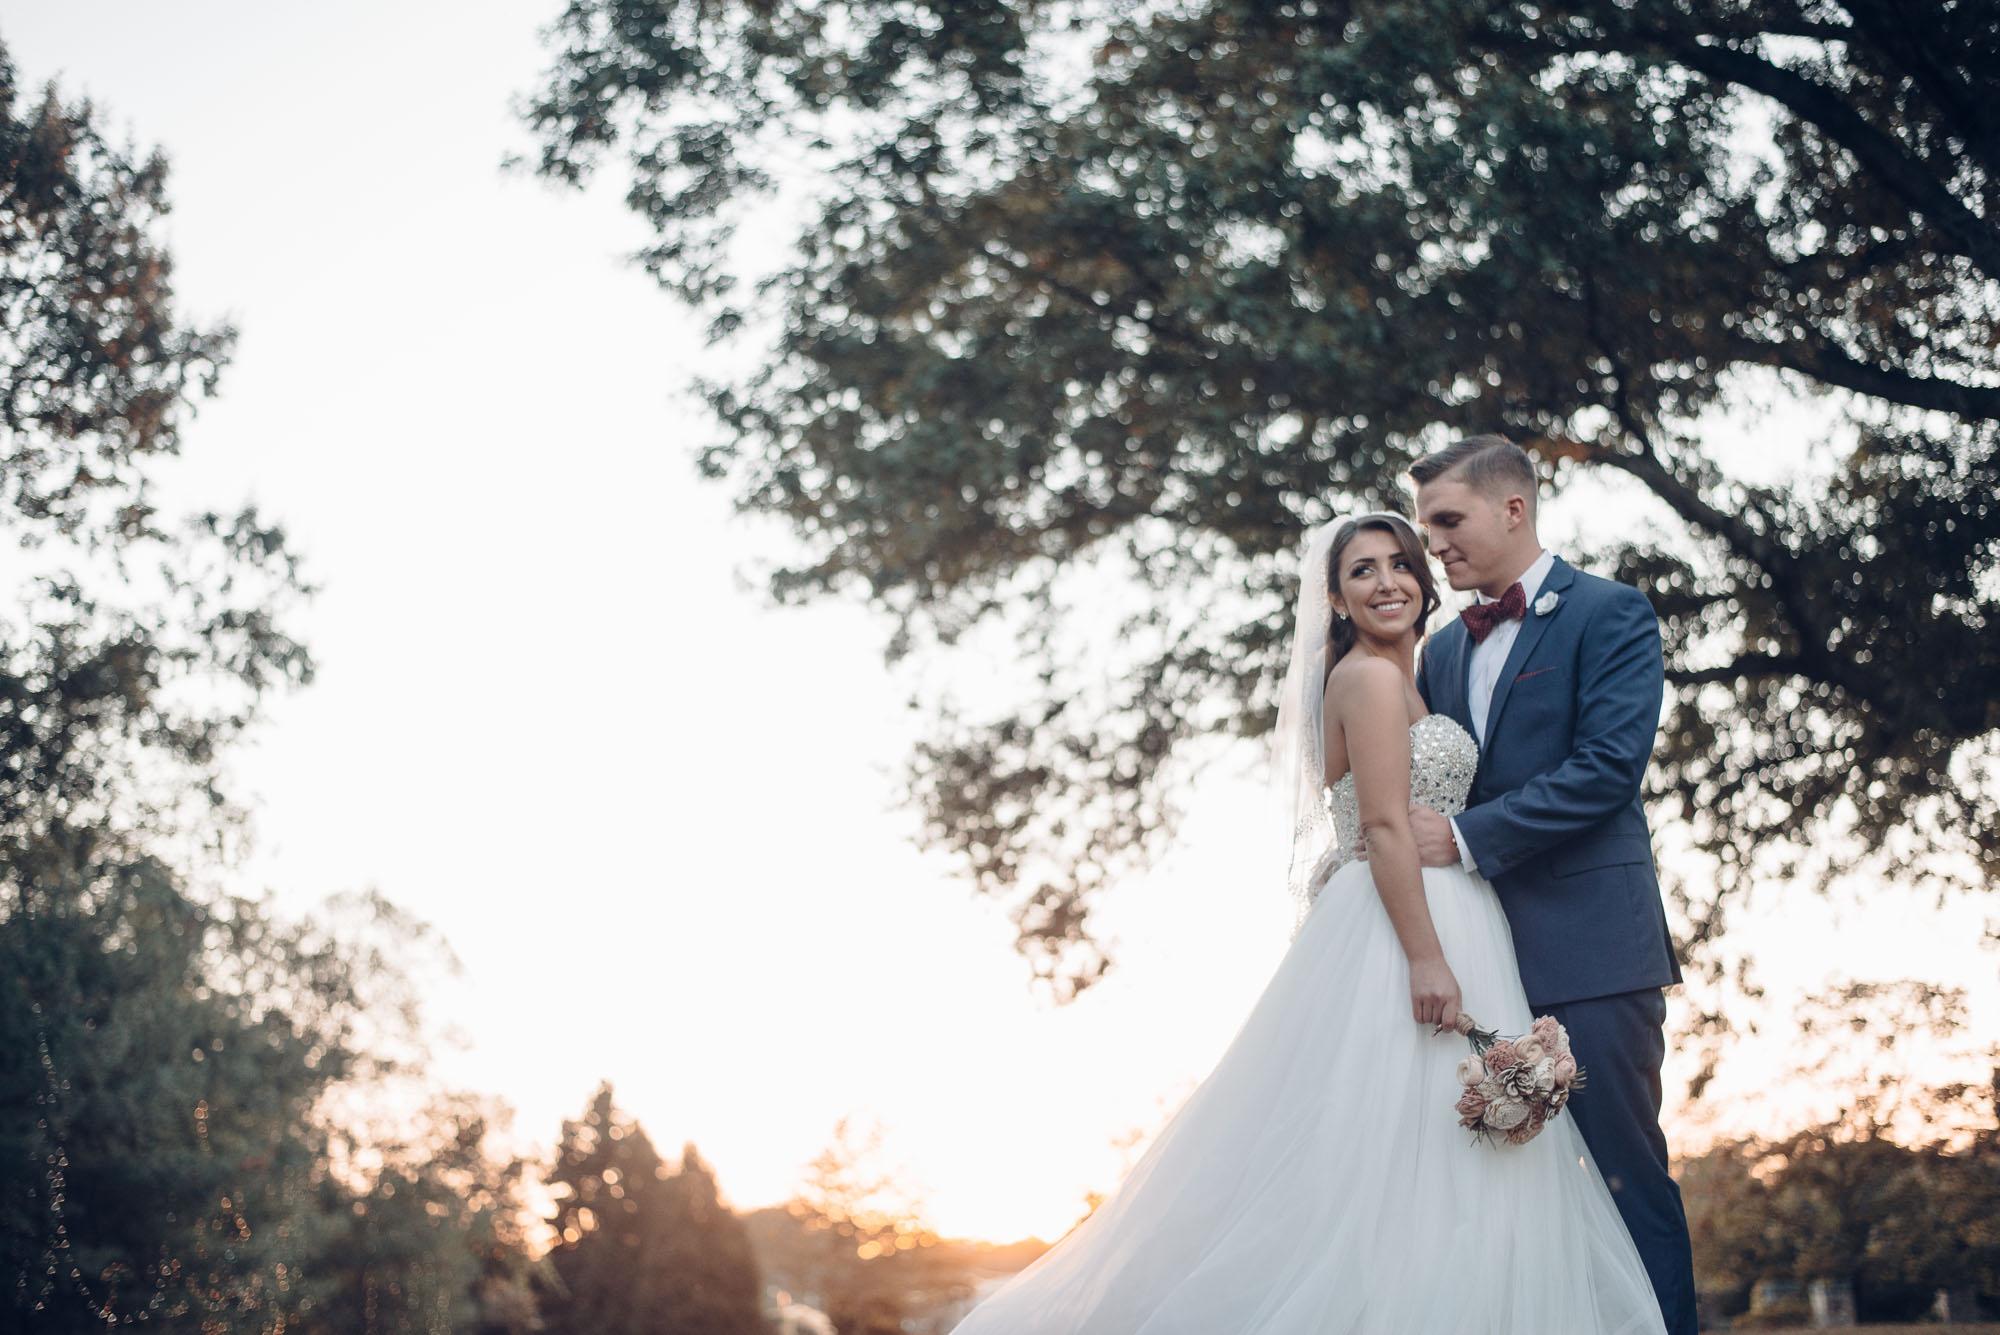 woodwinds_wedding_171020_web-40.jpg